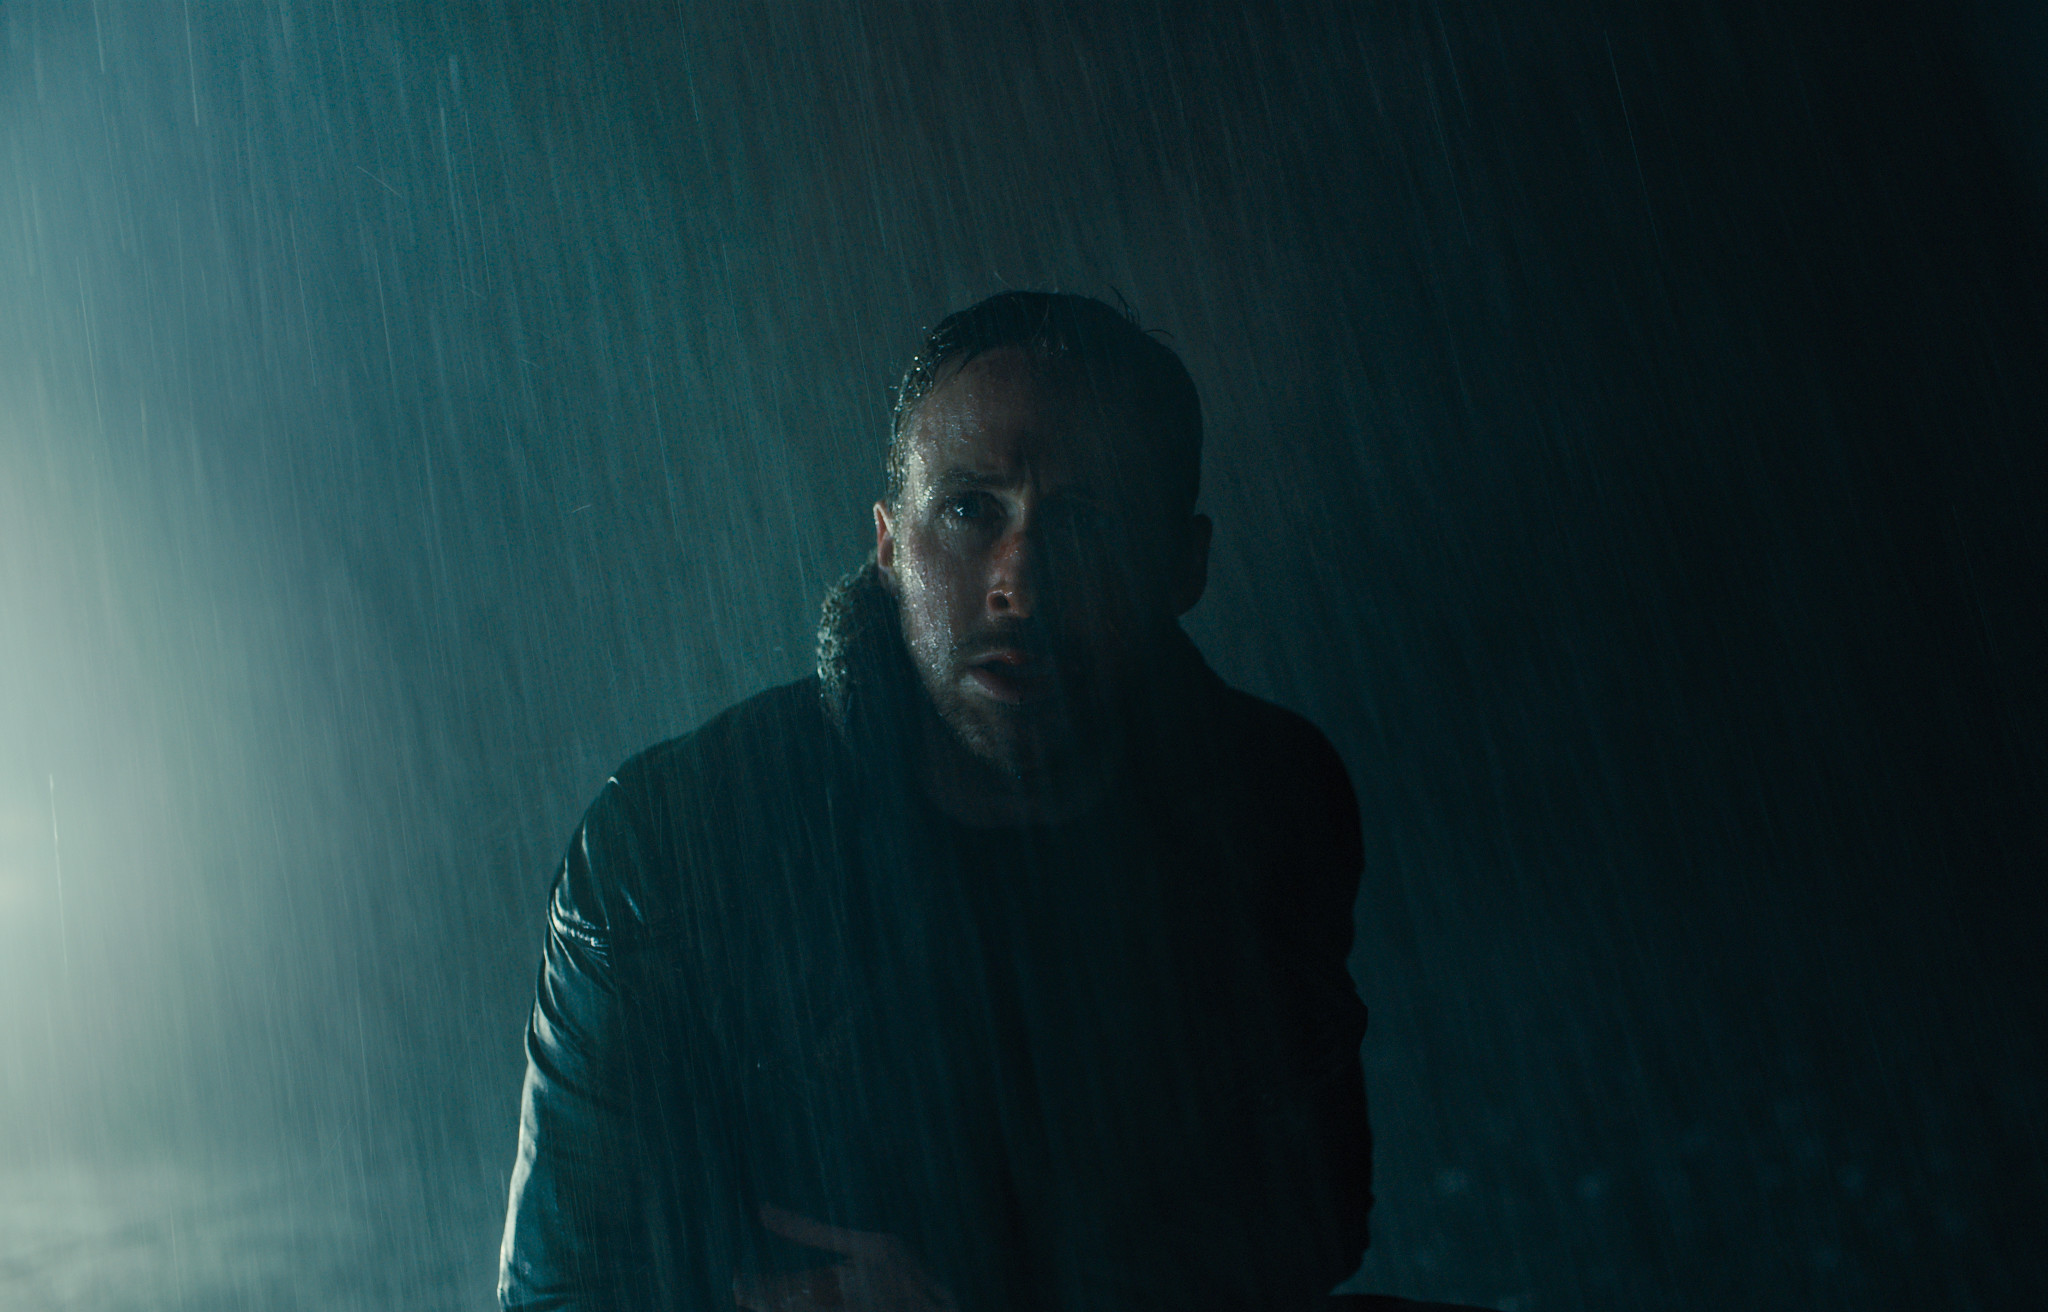 Movie – Blade Runner 2049 Ryan Gosling Wallpaper